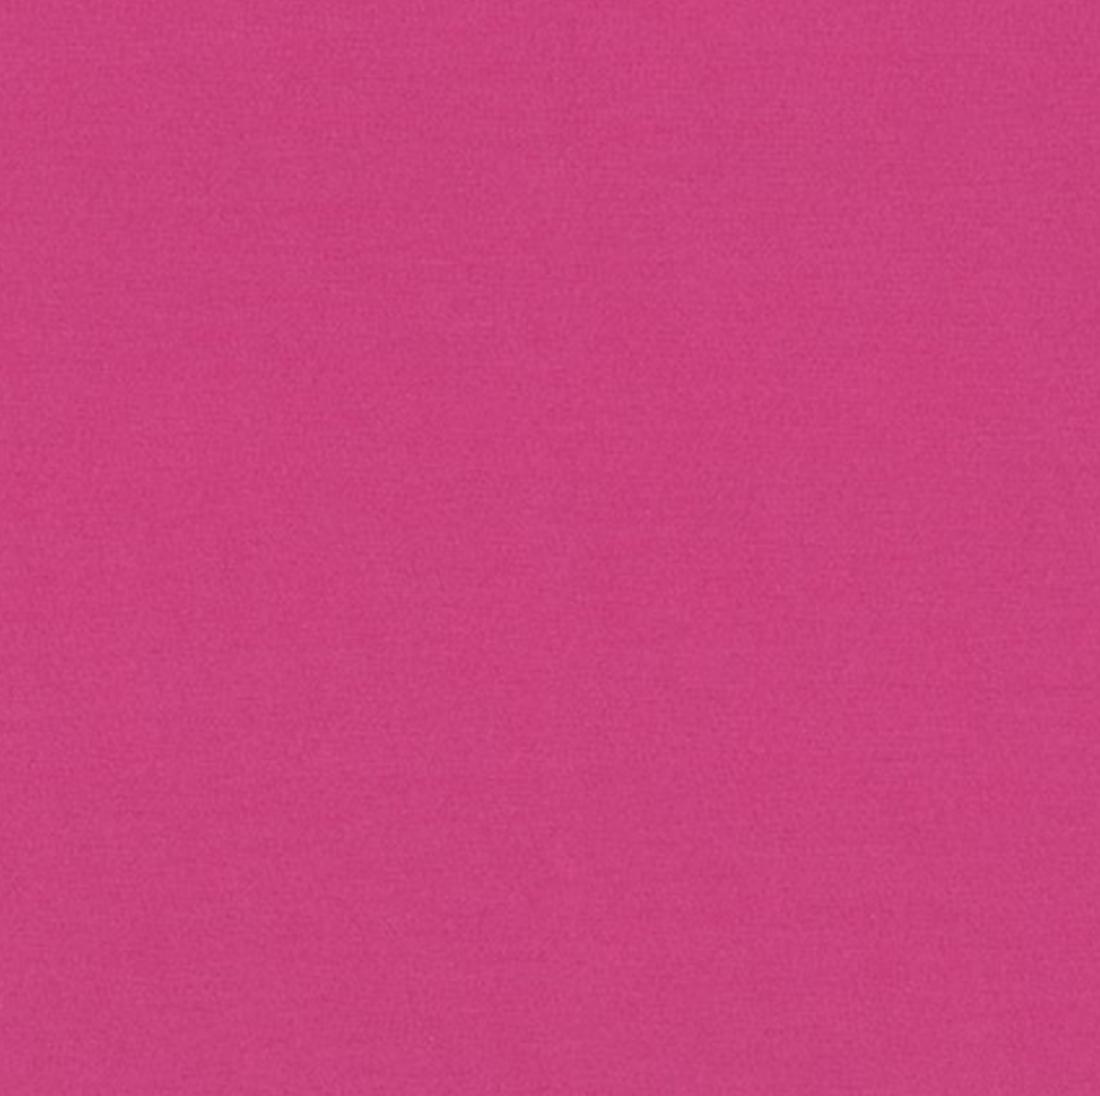 Hot Pink - Arietta Ponte - Robert Kaufman